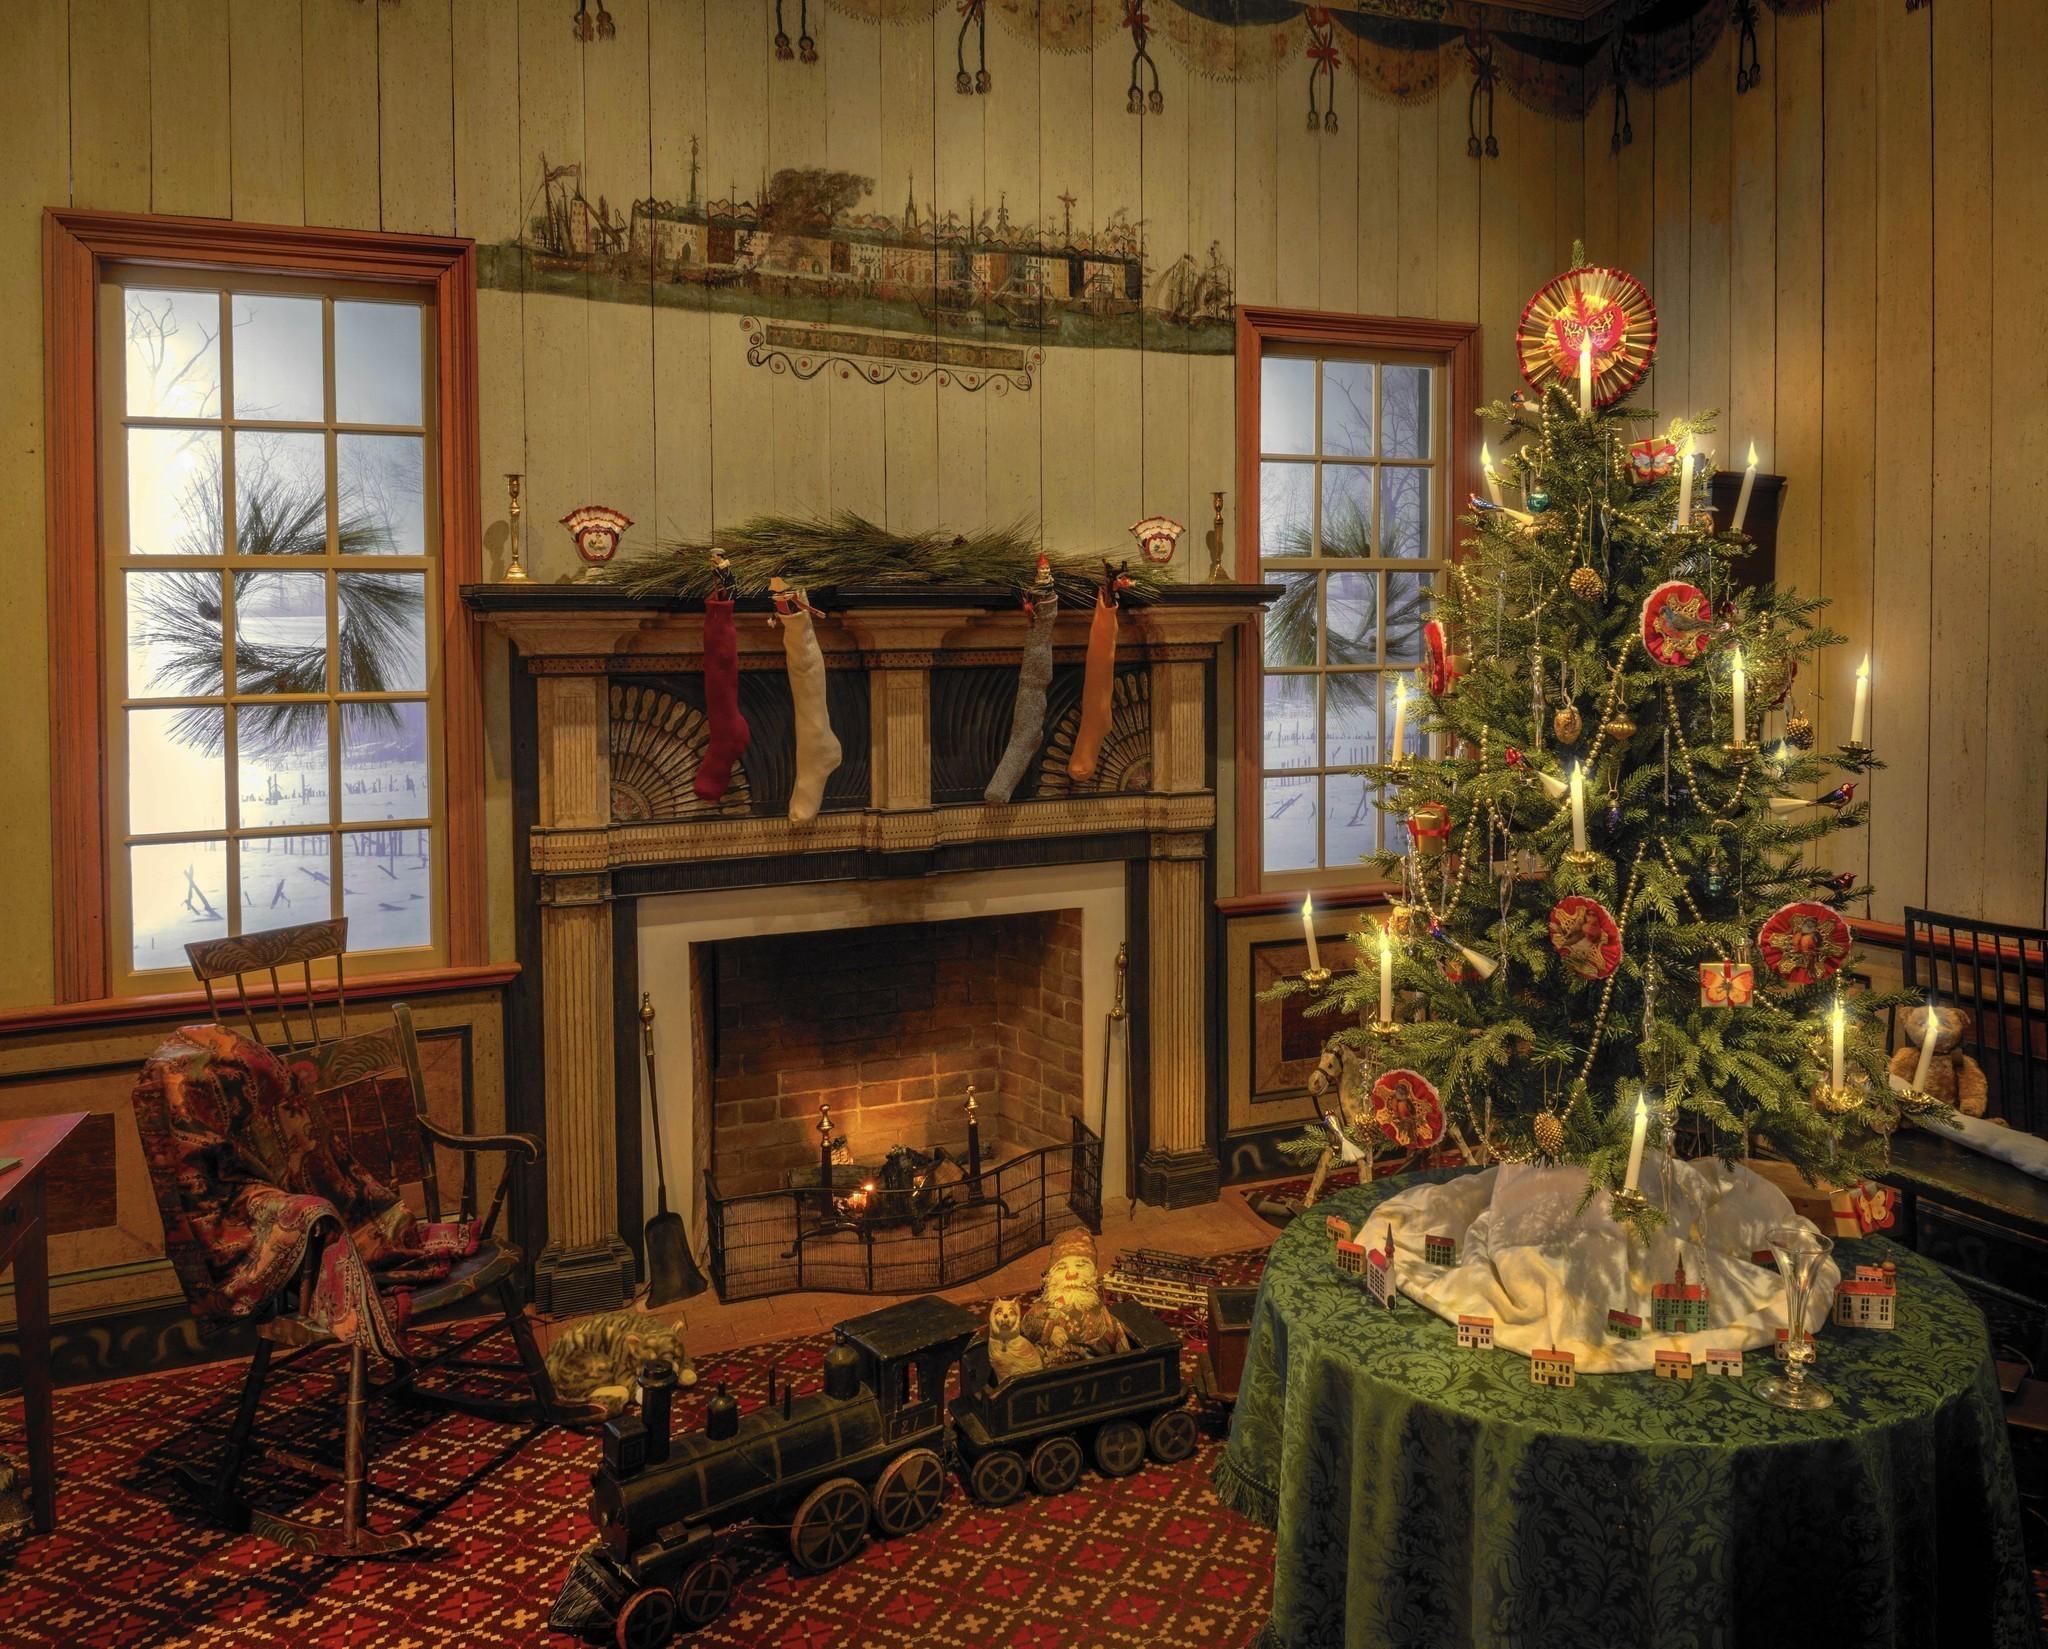 Cozy Fall Hd Wallpaper Colonial Williamsburg Christmas Exhibit Recalls The